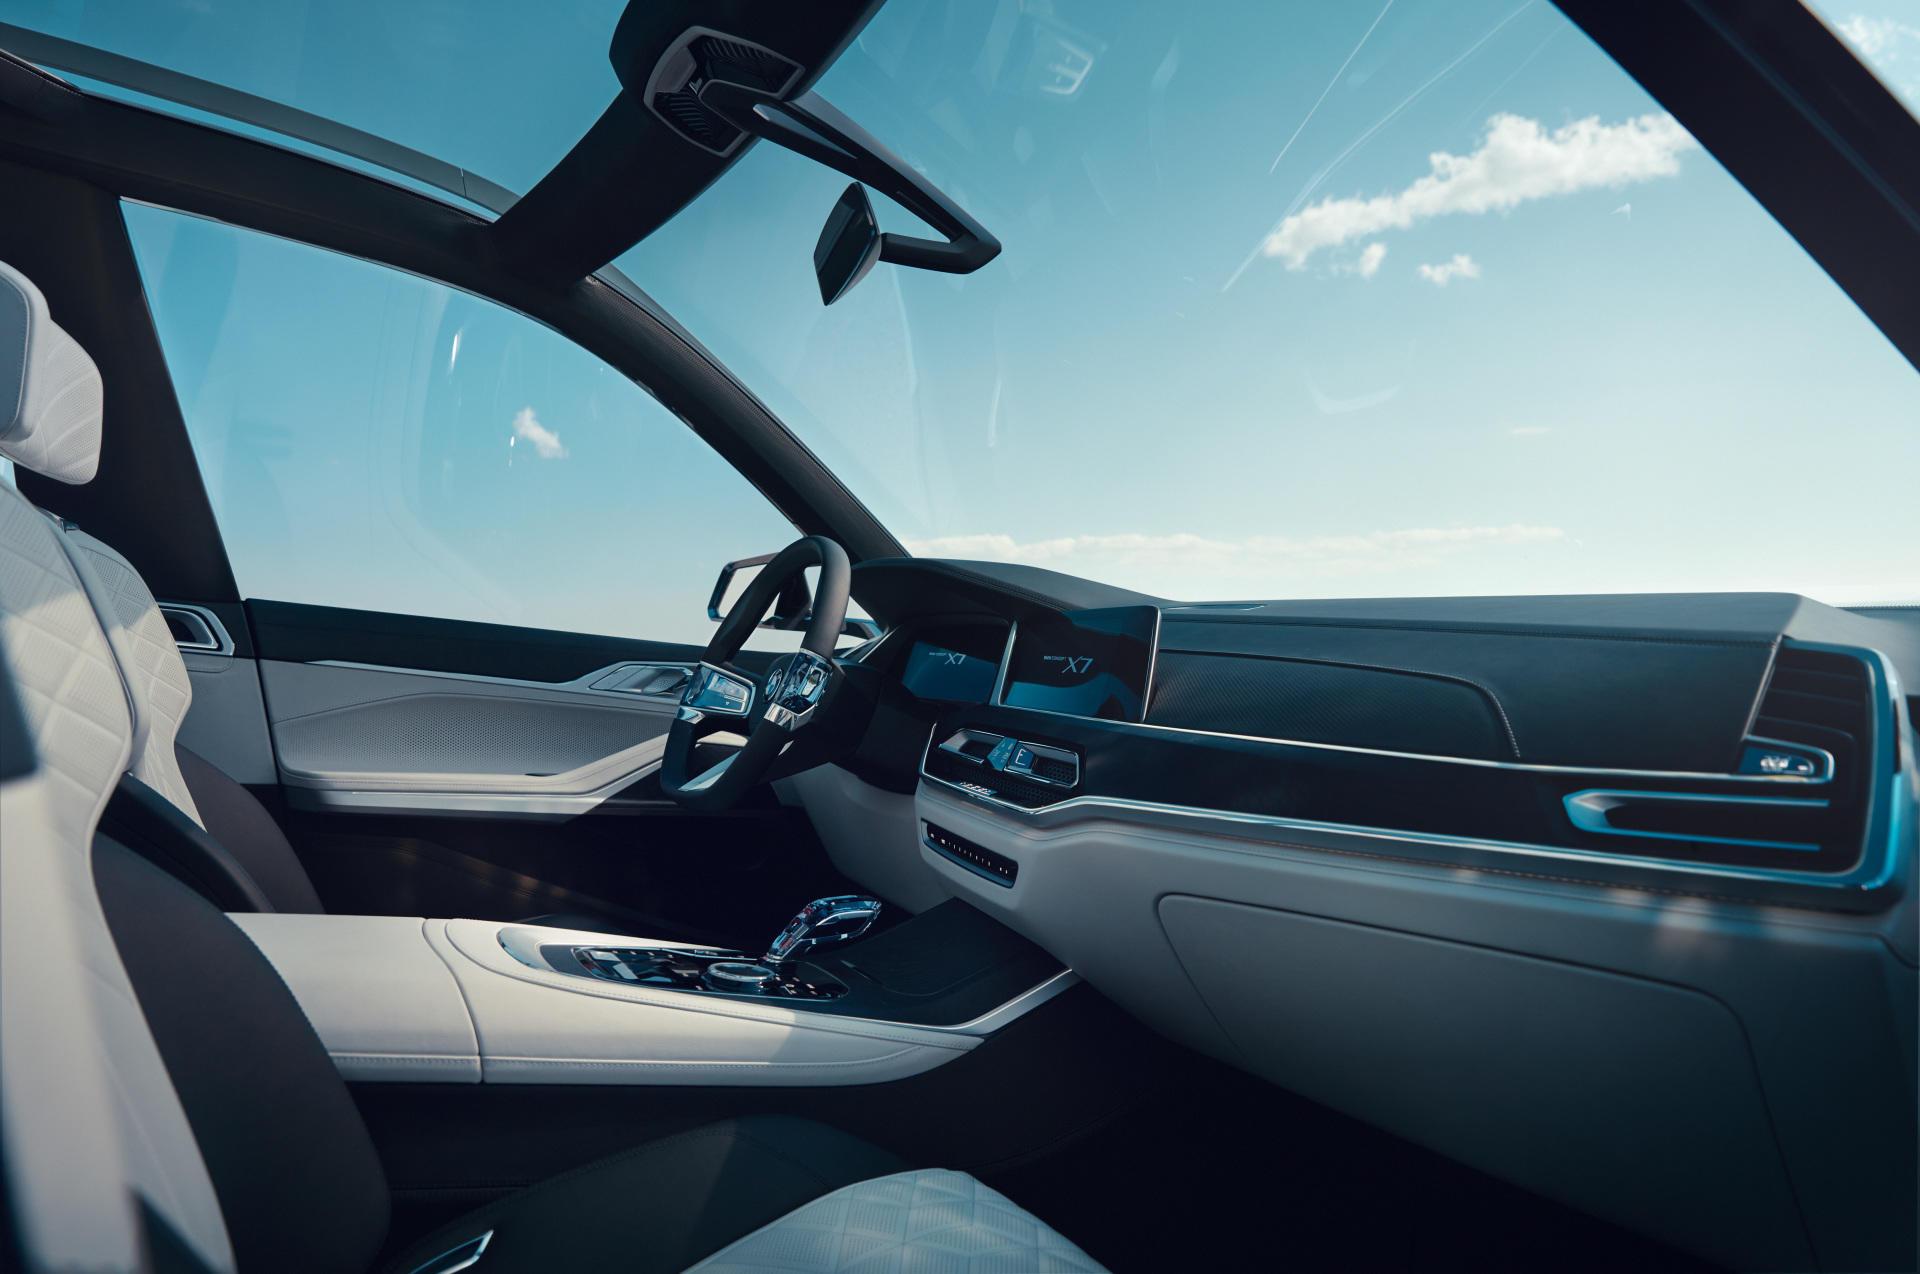 BMW-x7-concept-dm-9.jpg